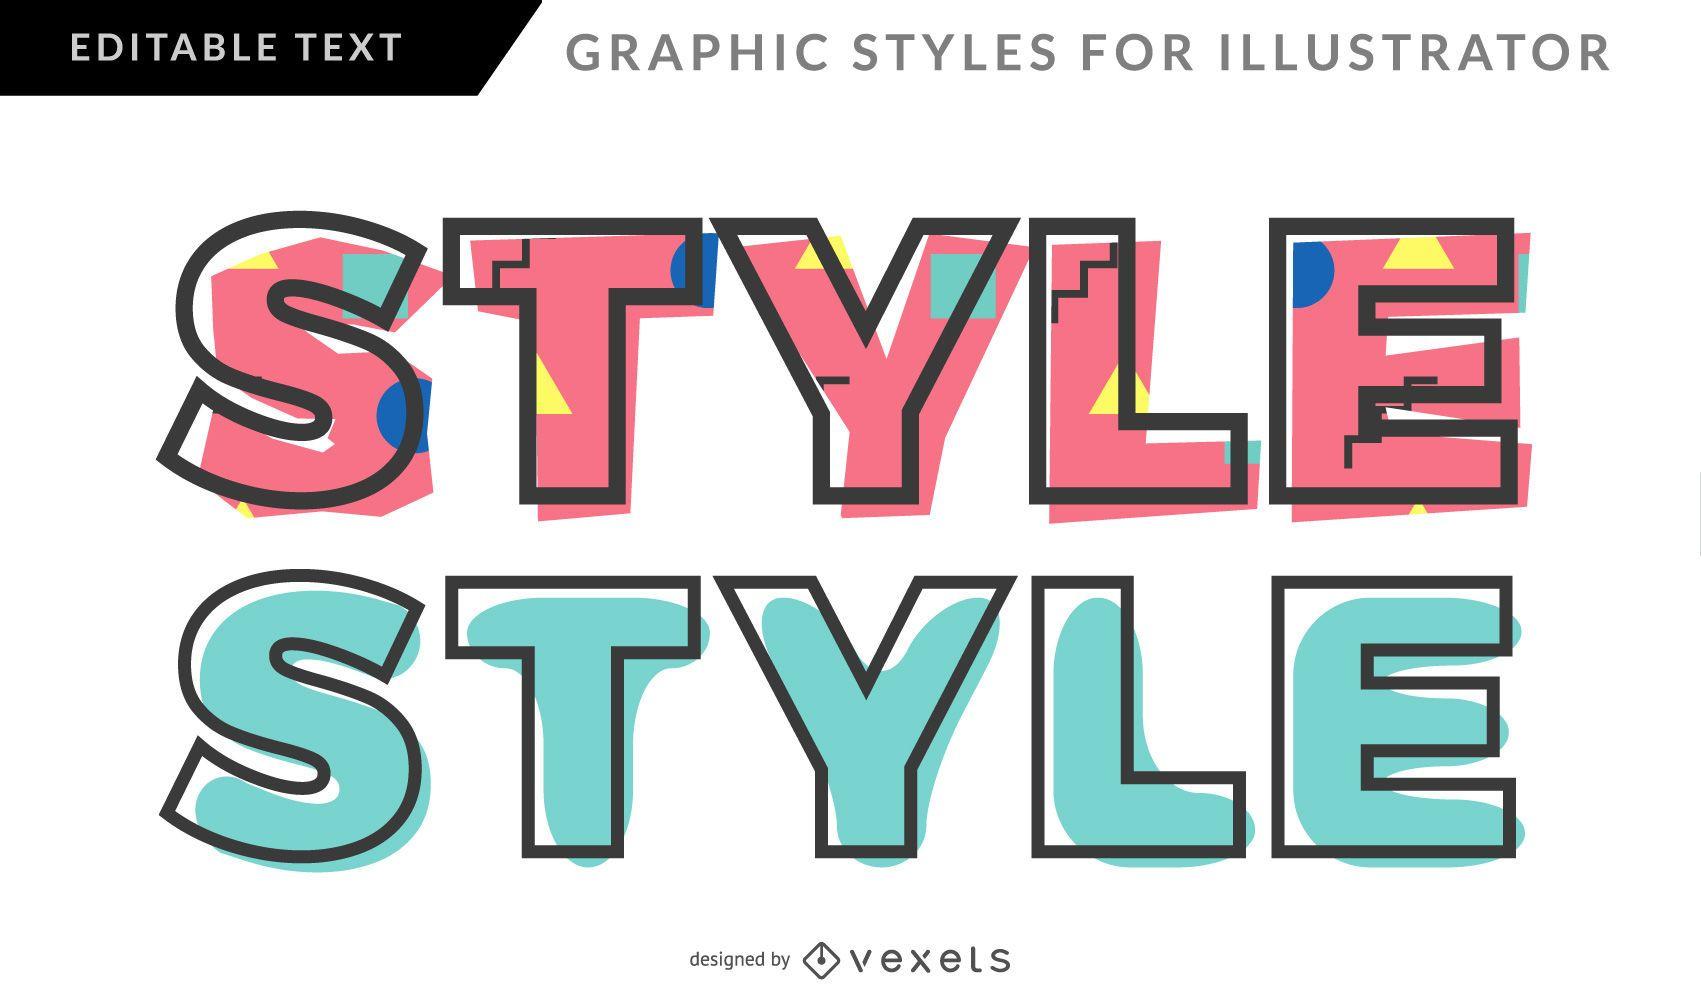 Memphis Graphic Style